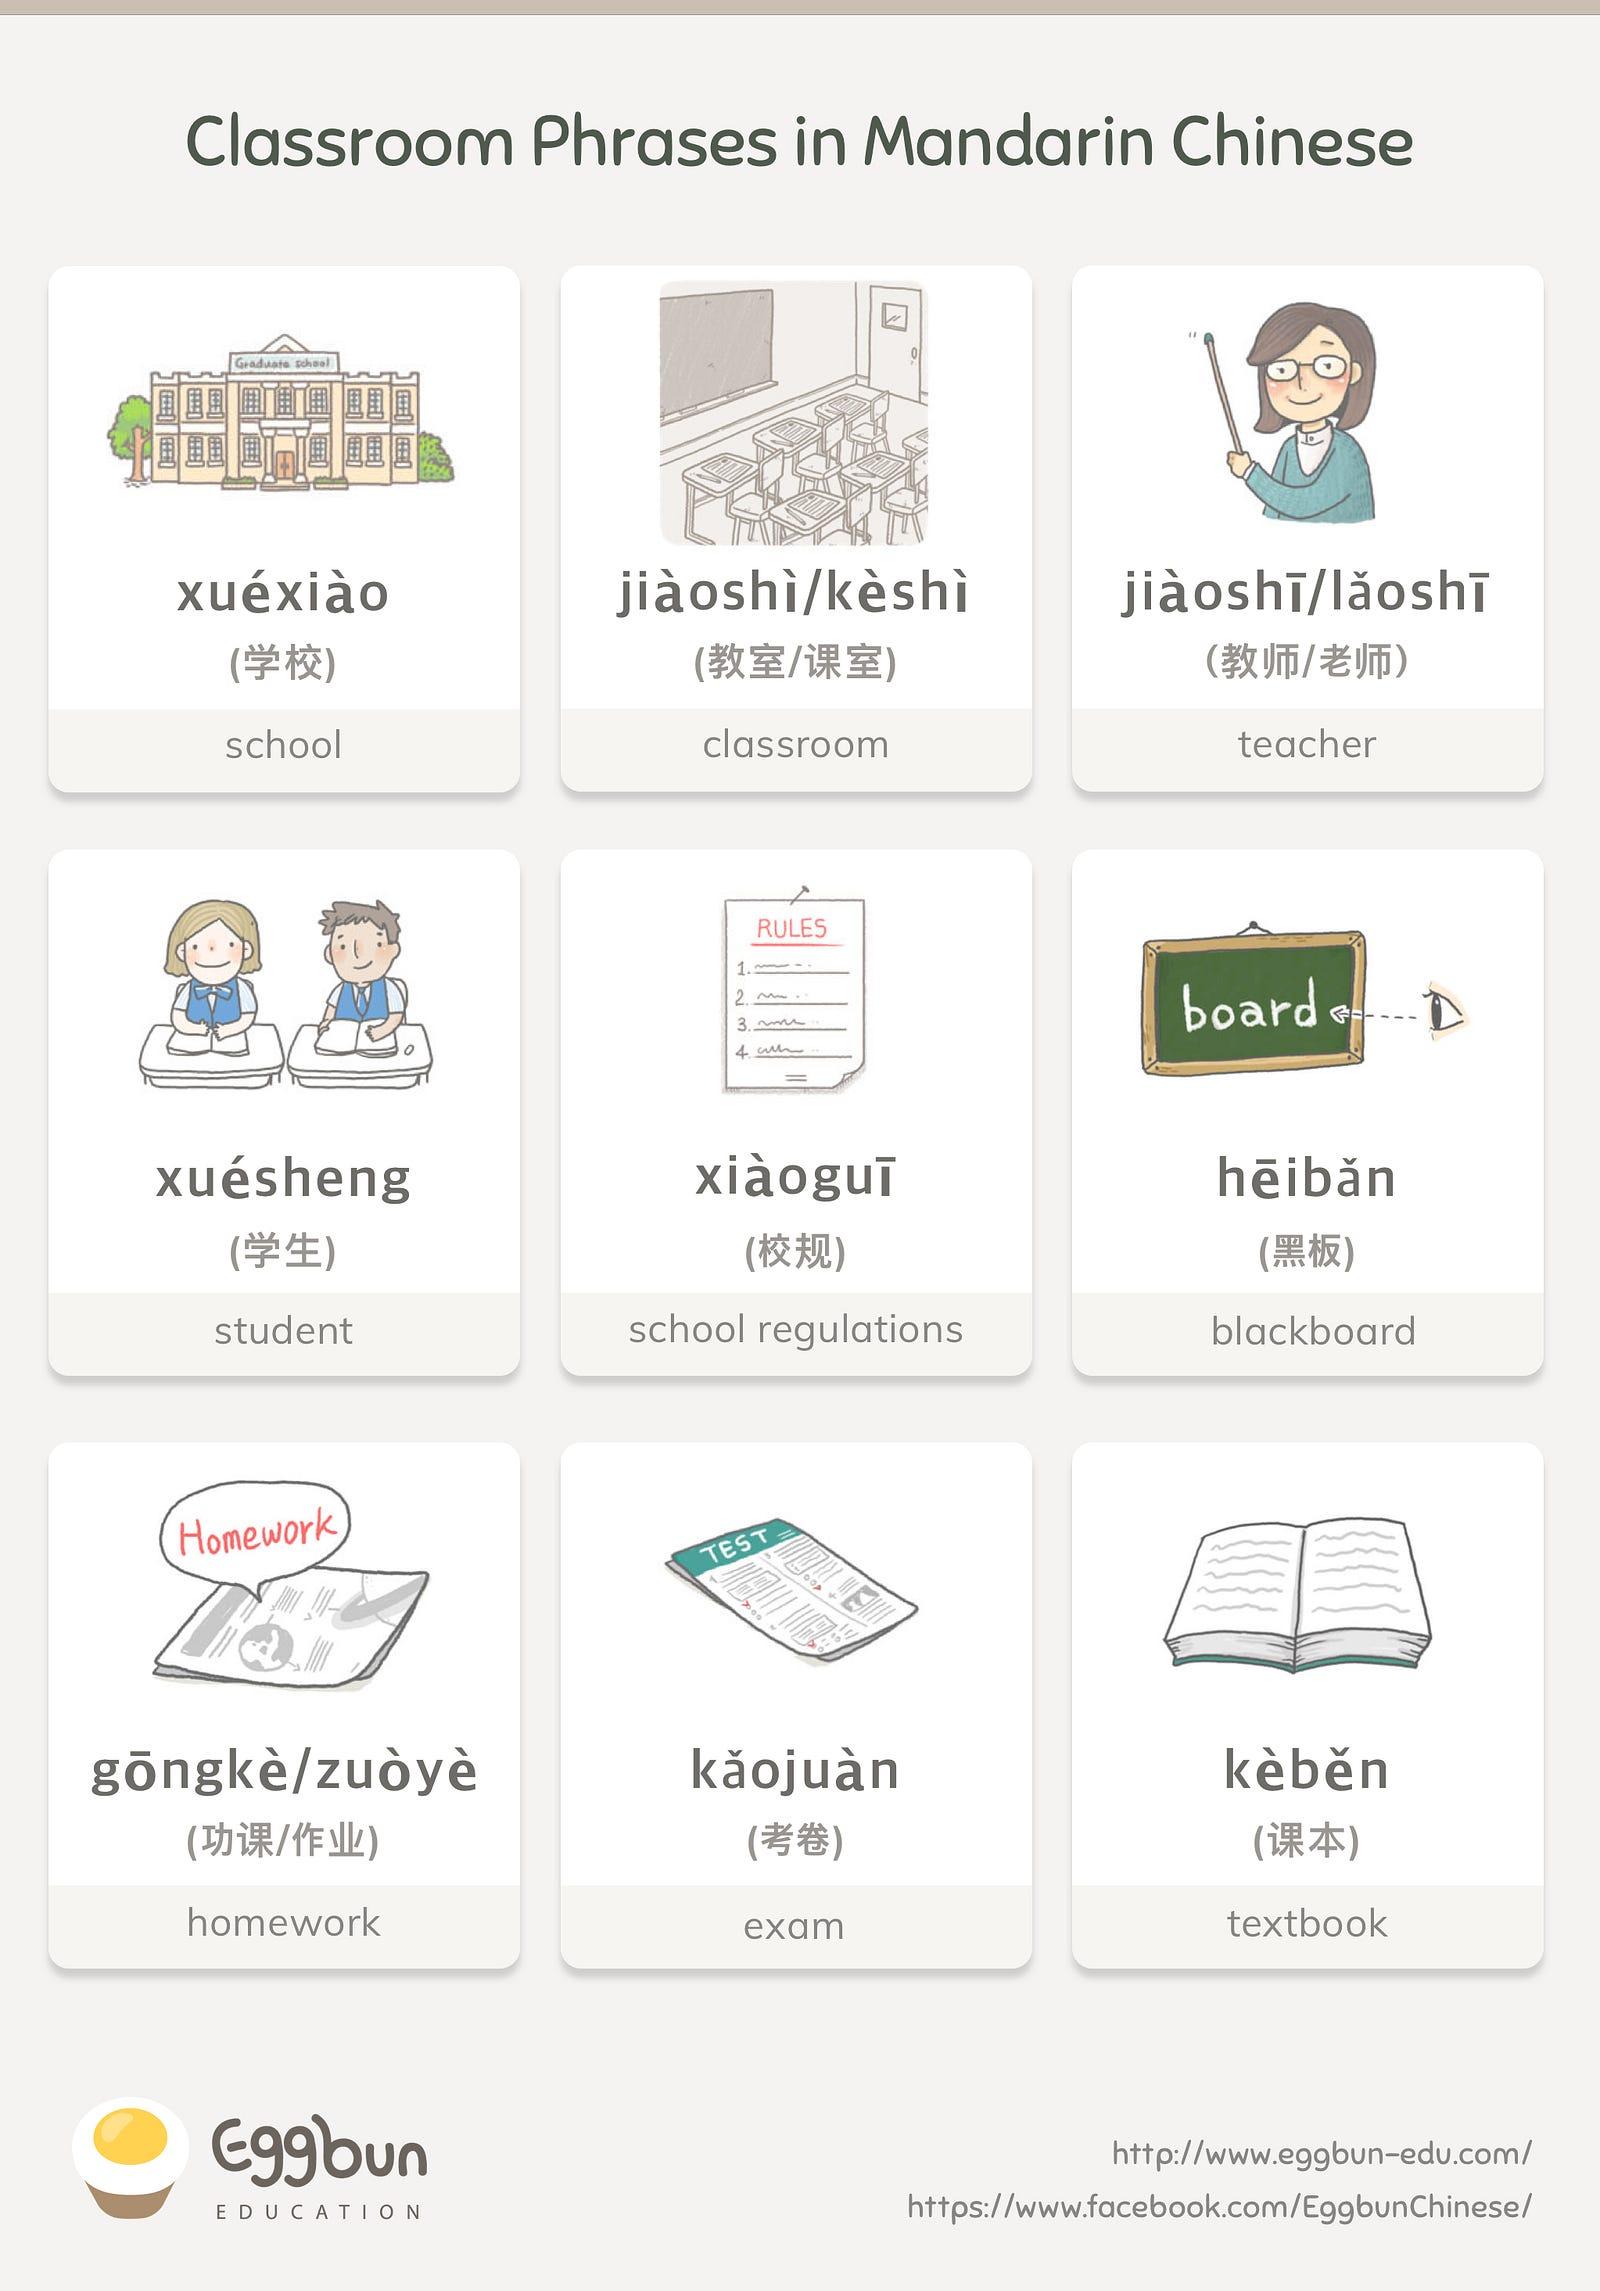 Classroom Phrases In Mandarin Chinese Story Of Eggbun Education Medium